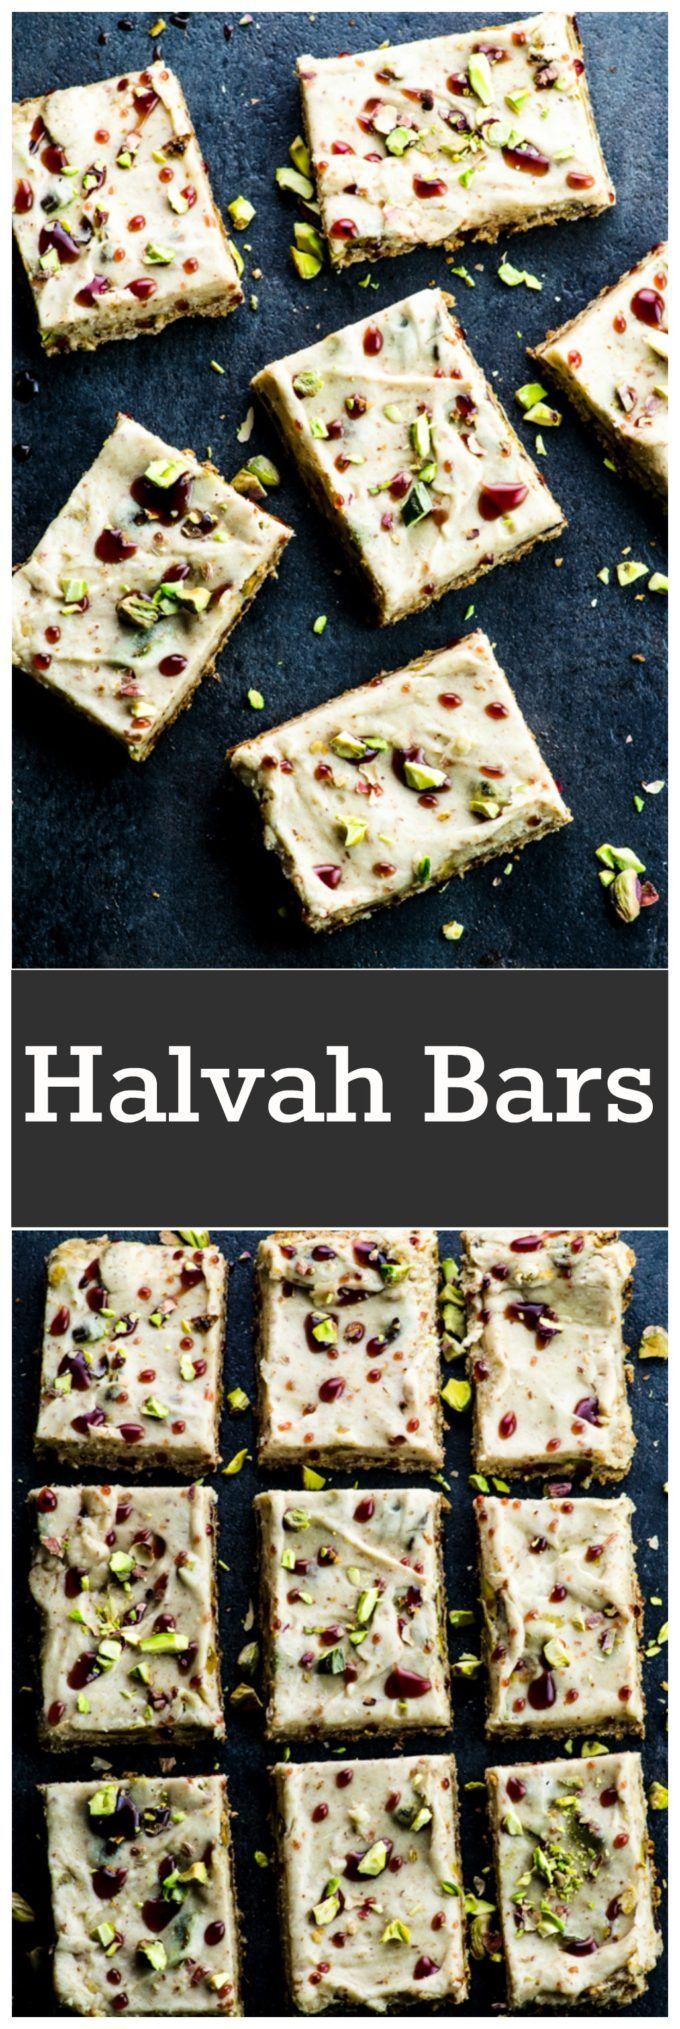 These vegan halvah bars are definitely not your ev…Edit description